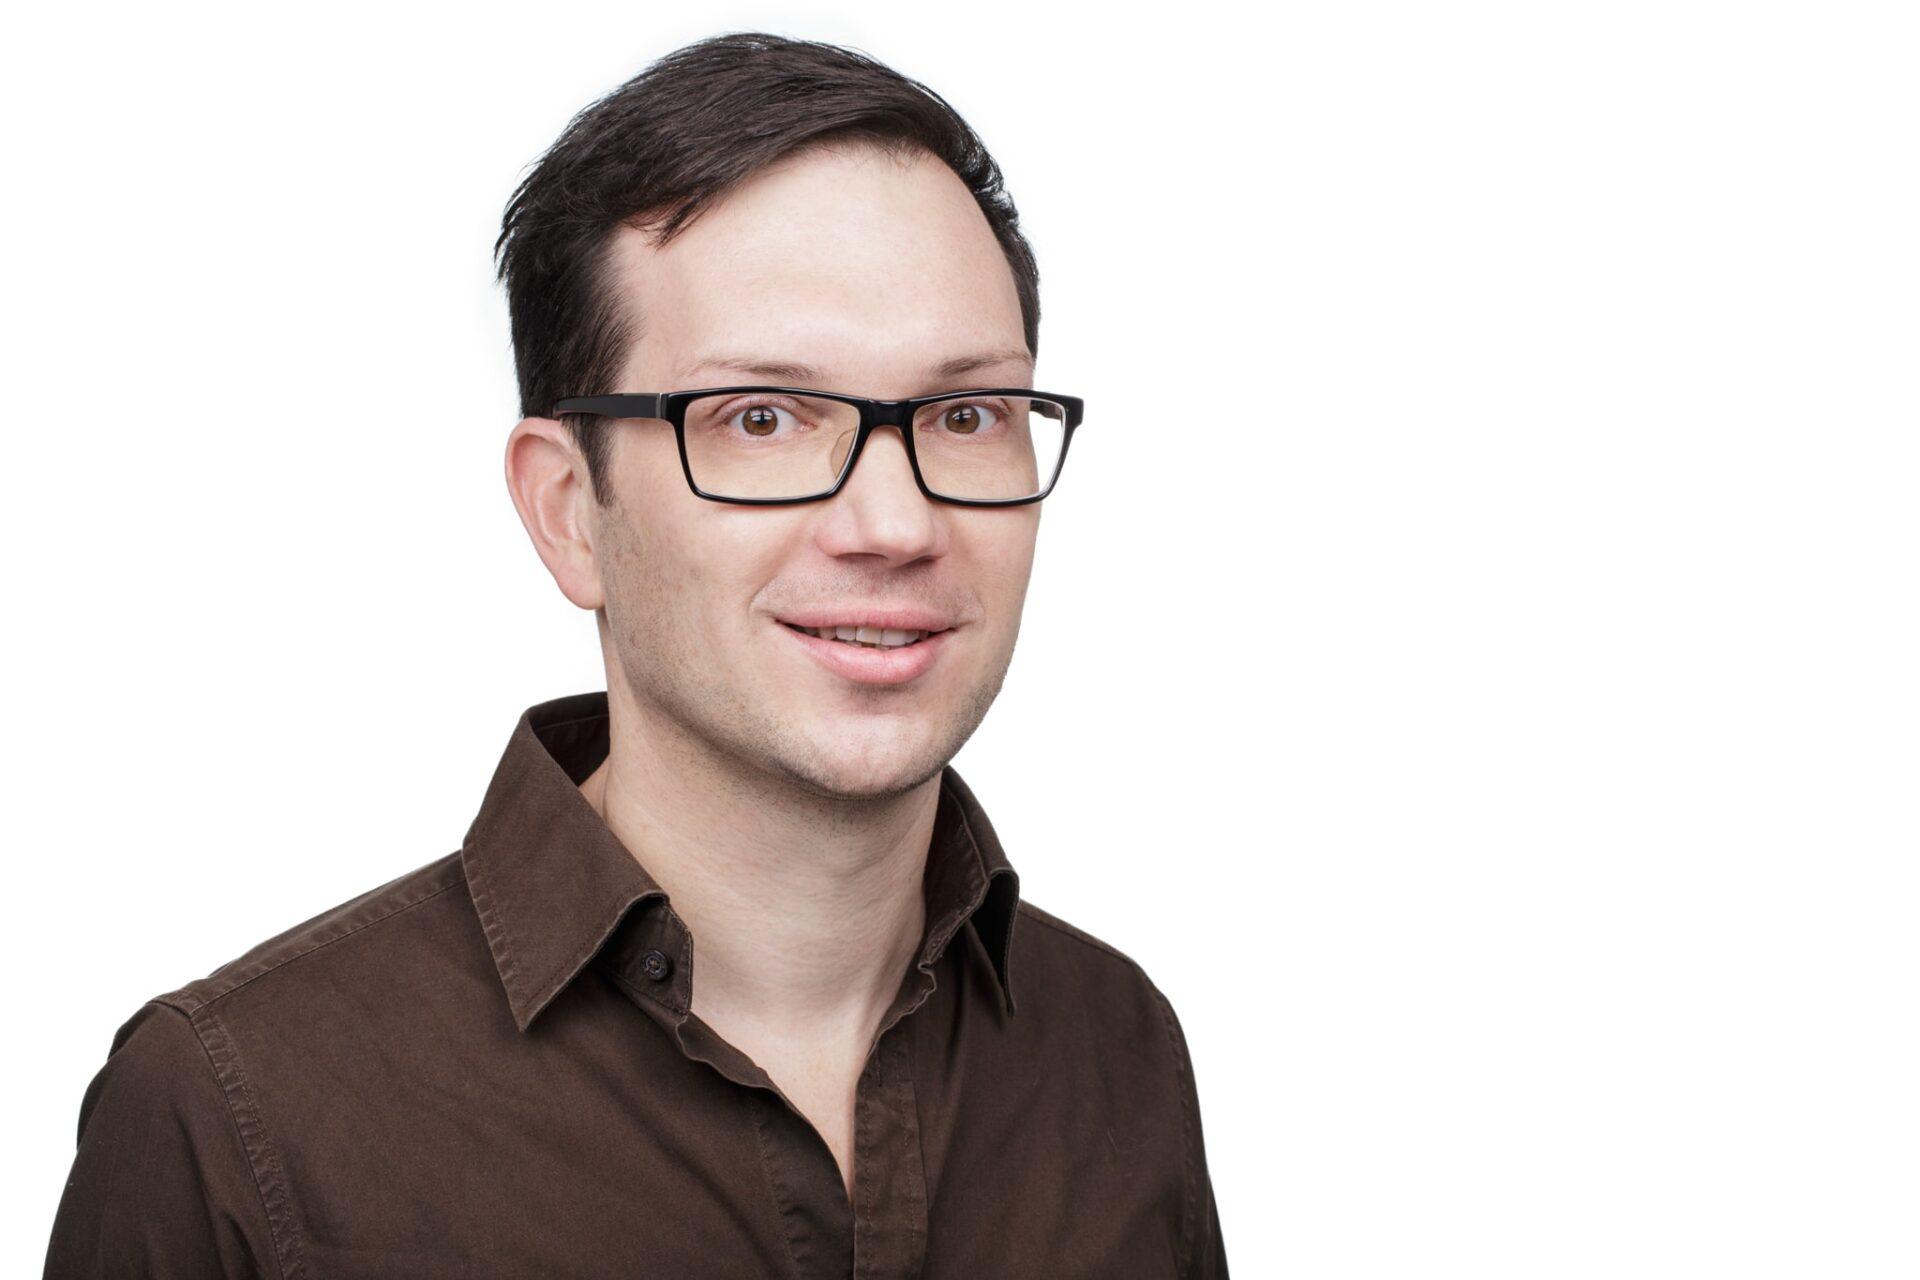 Adrian Gschwend